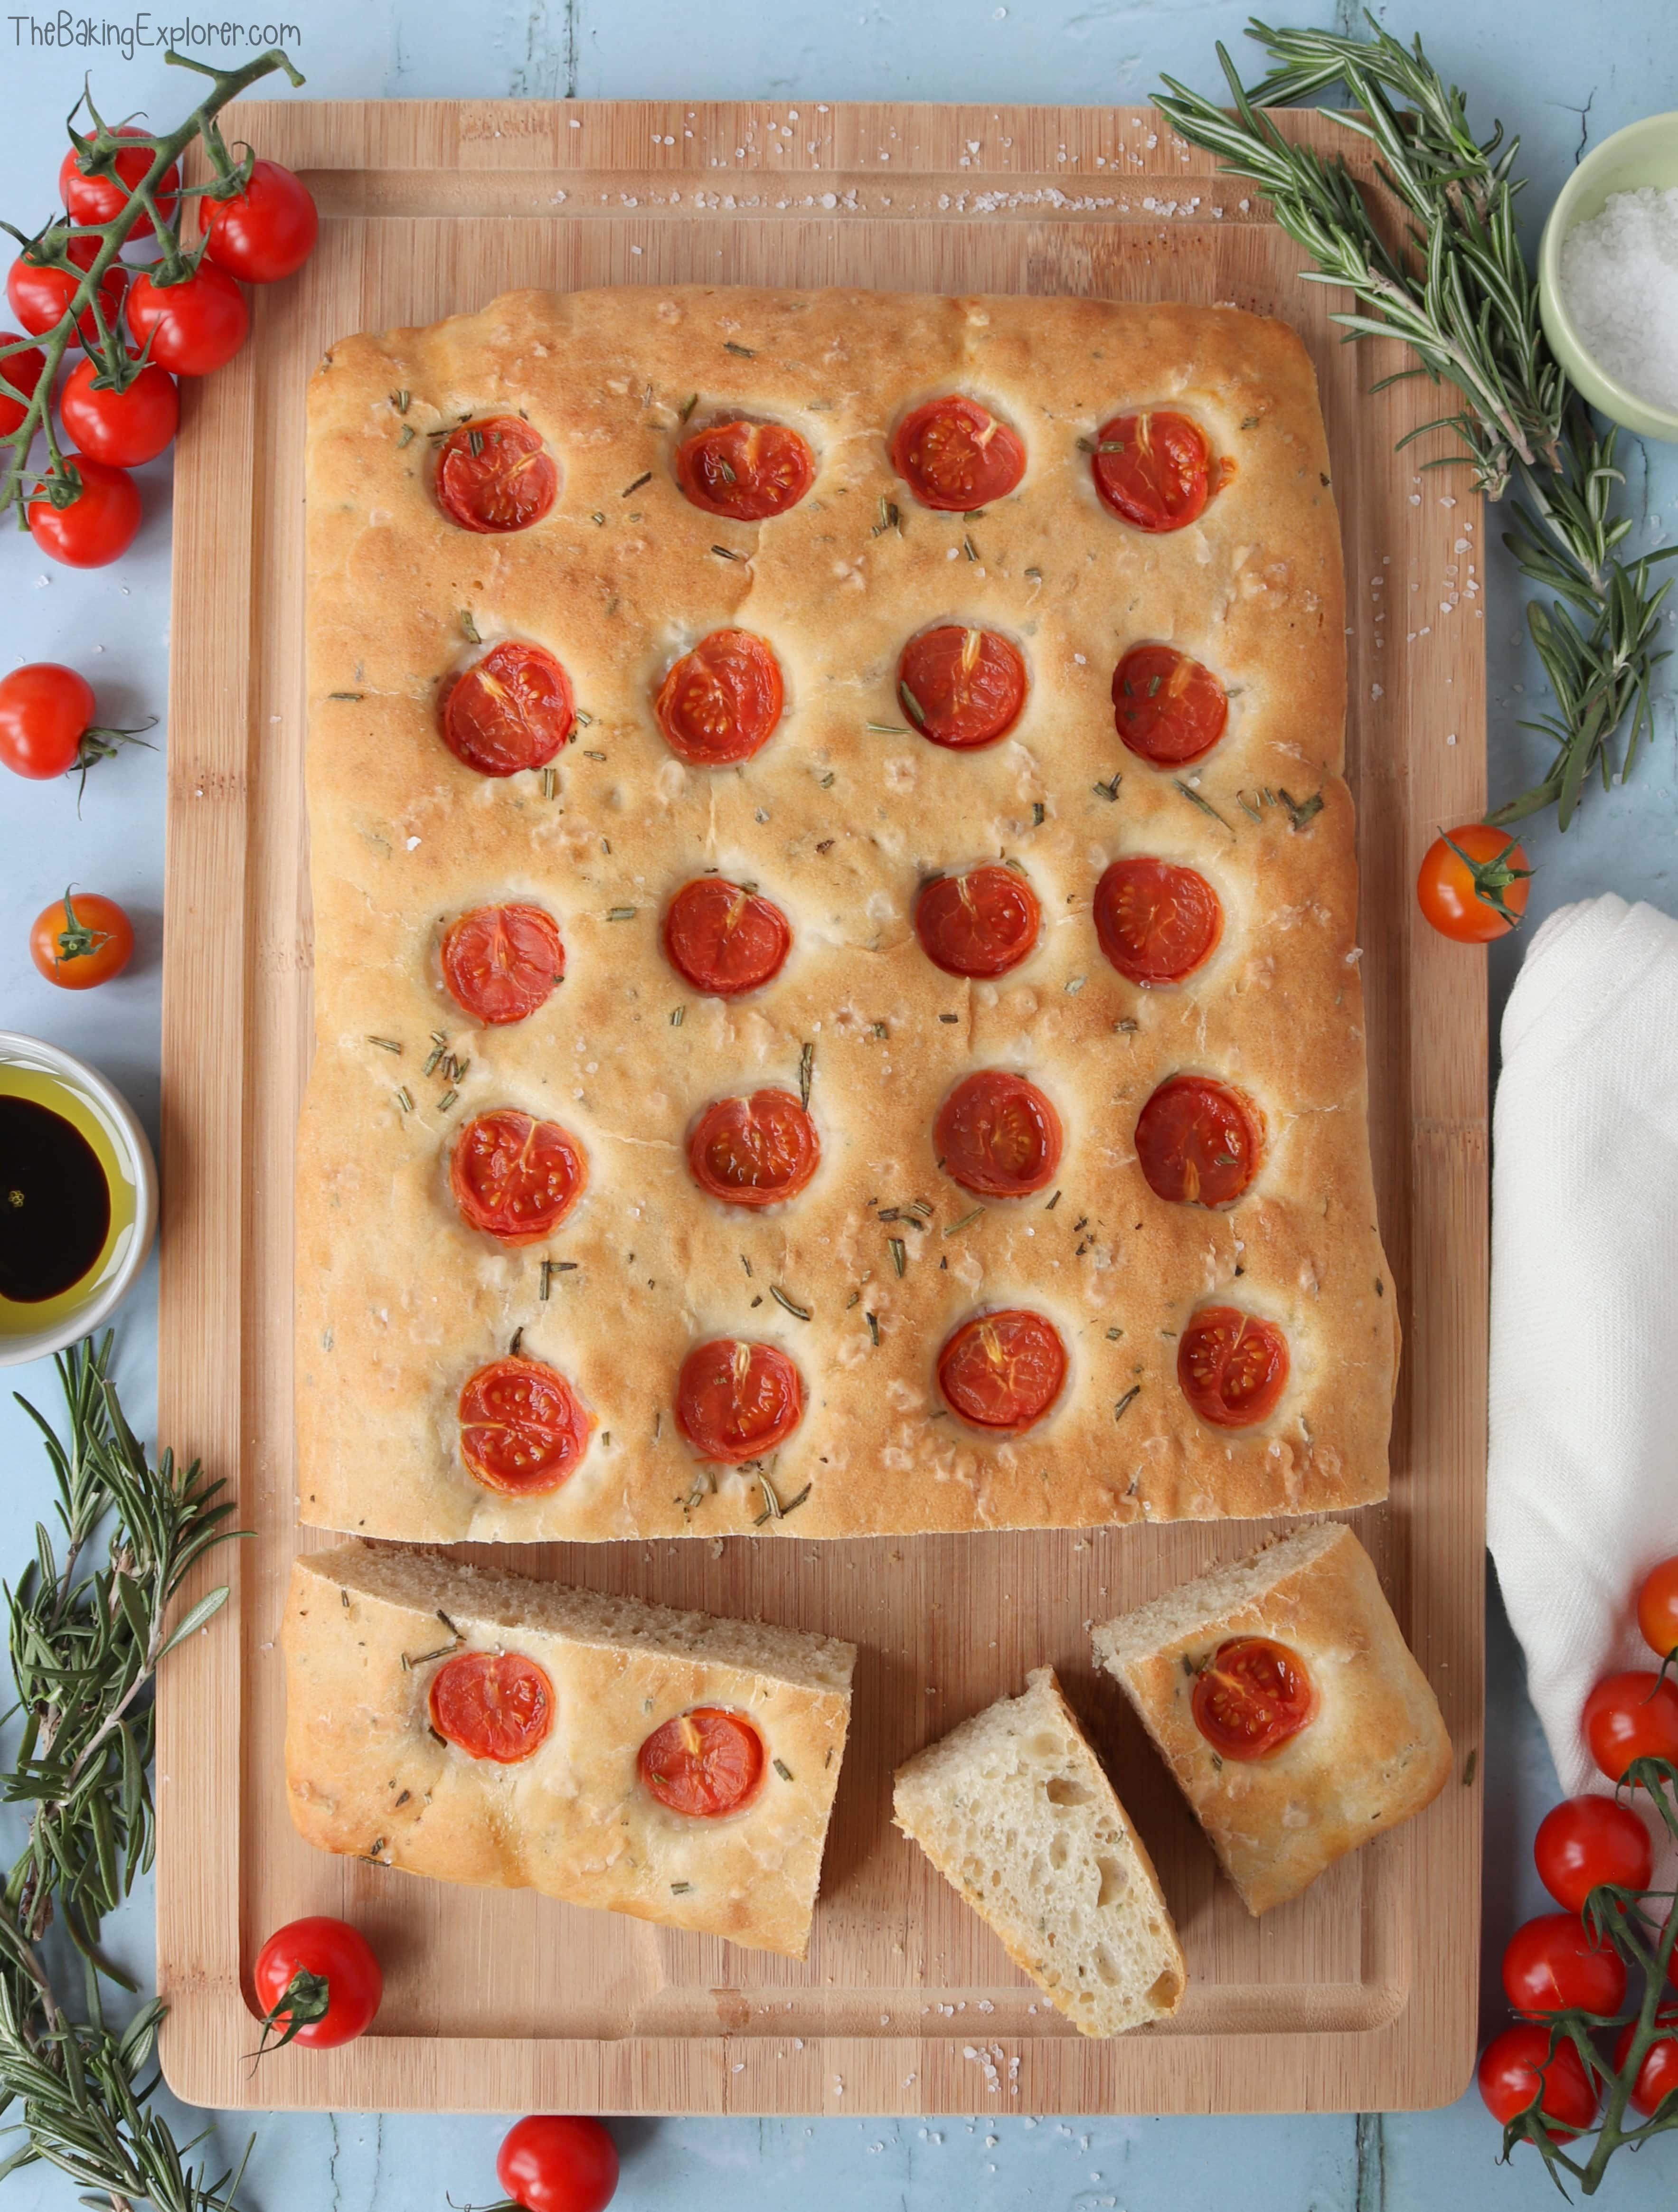 Tomato & Rosemary Focaccia